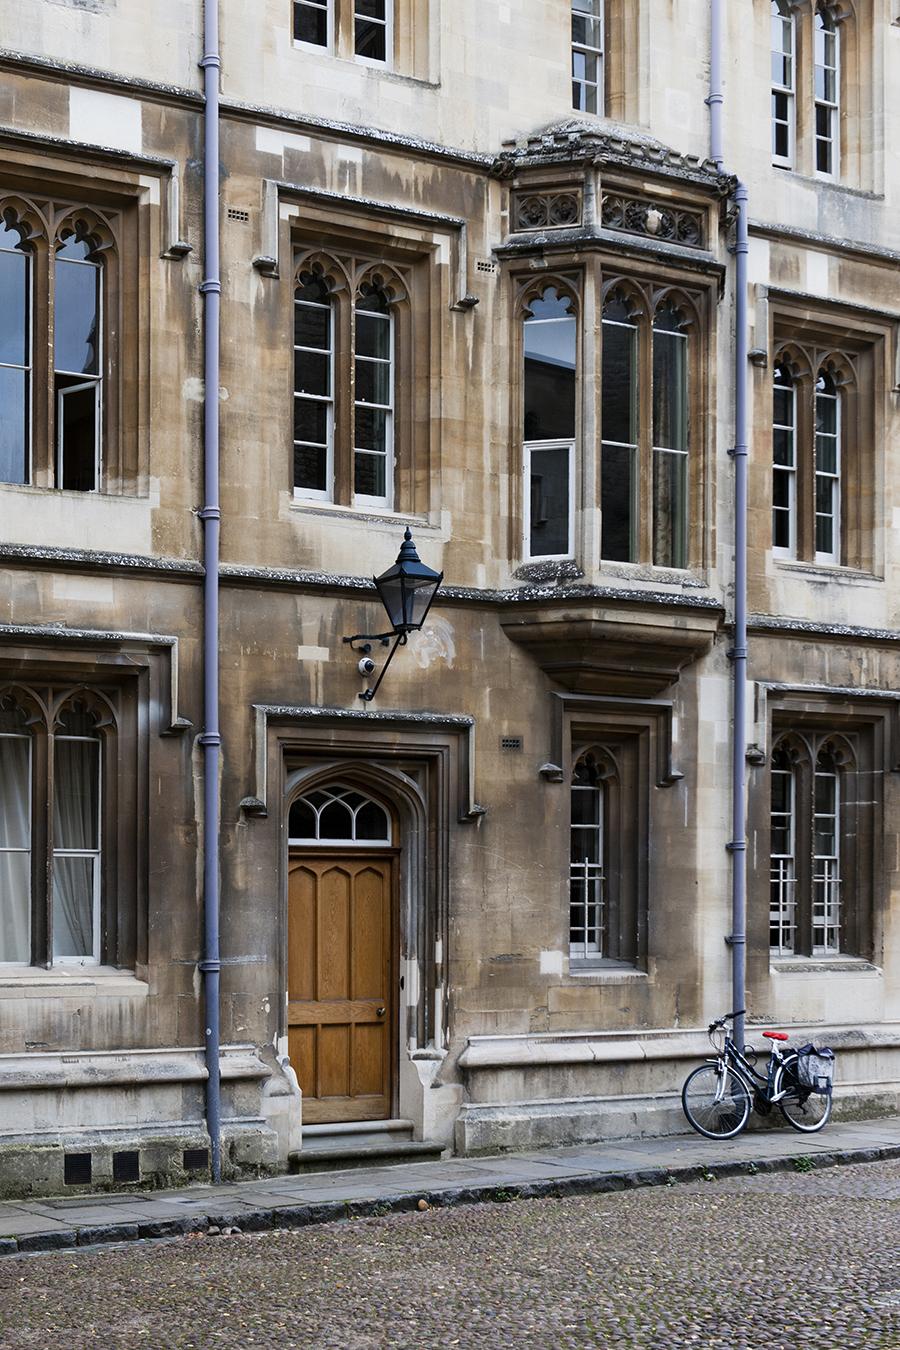 The Architecture of Oxford No. 2